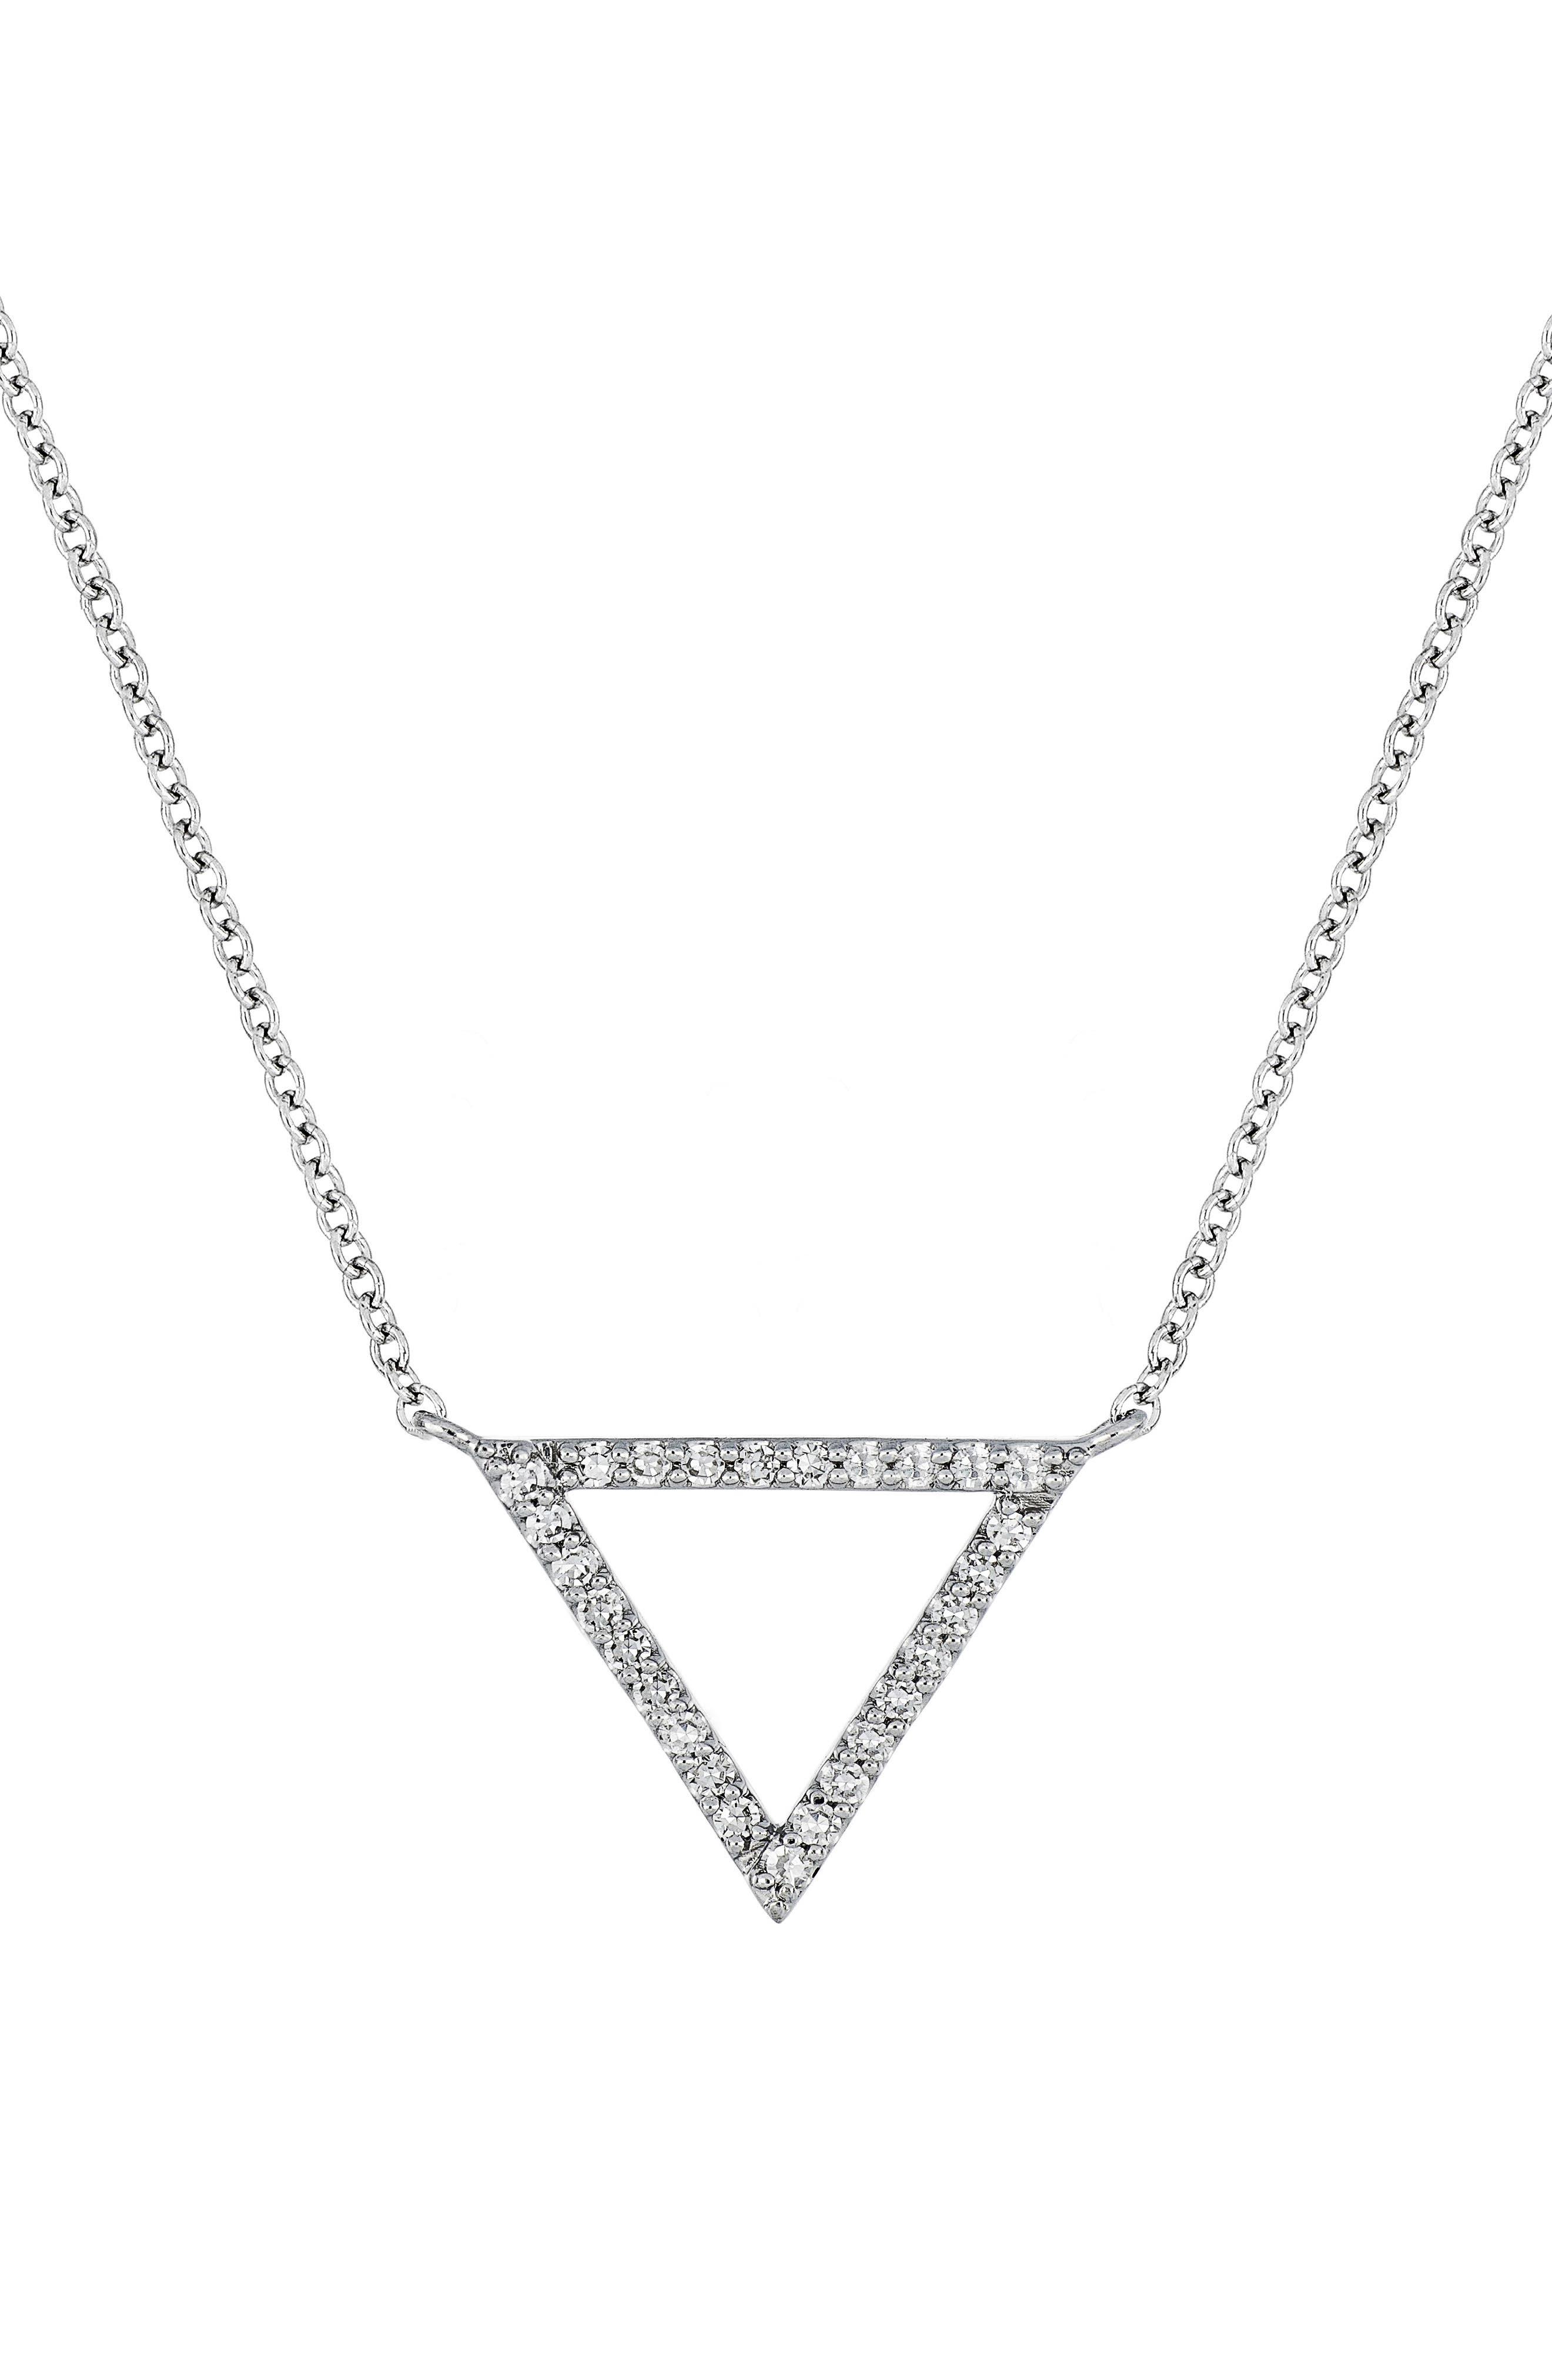 Carrière Medium Triangle Diamond Pendant Necklace,                         Main,                         color, STERLING SILVER/ DIAMOND